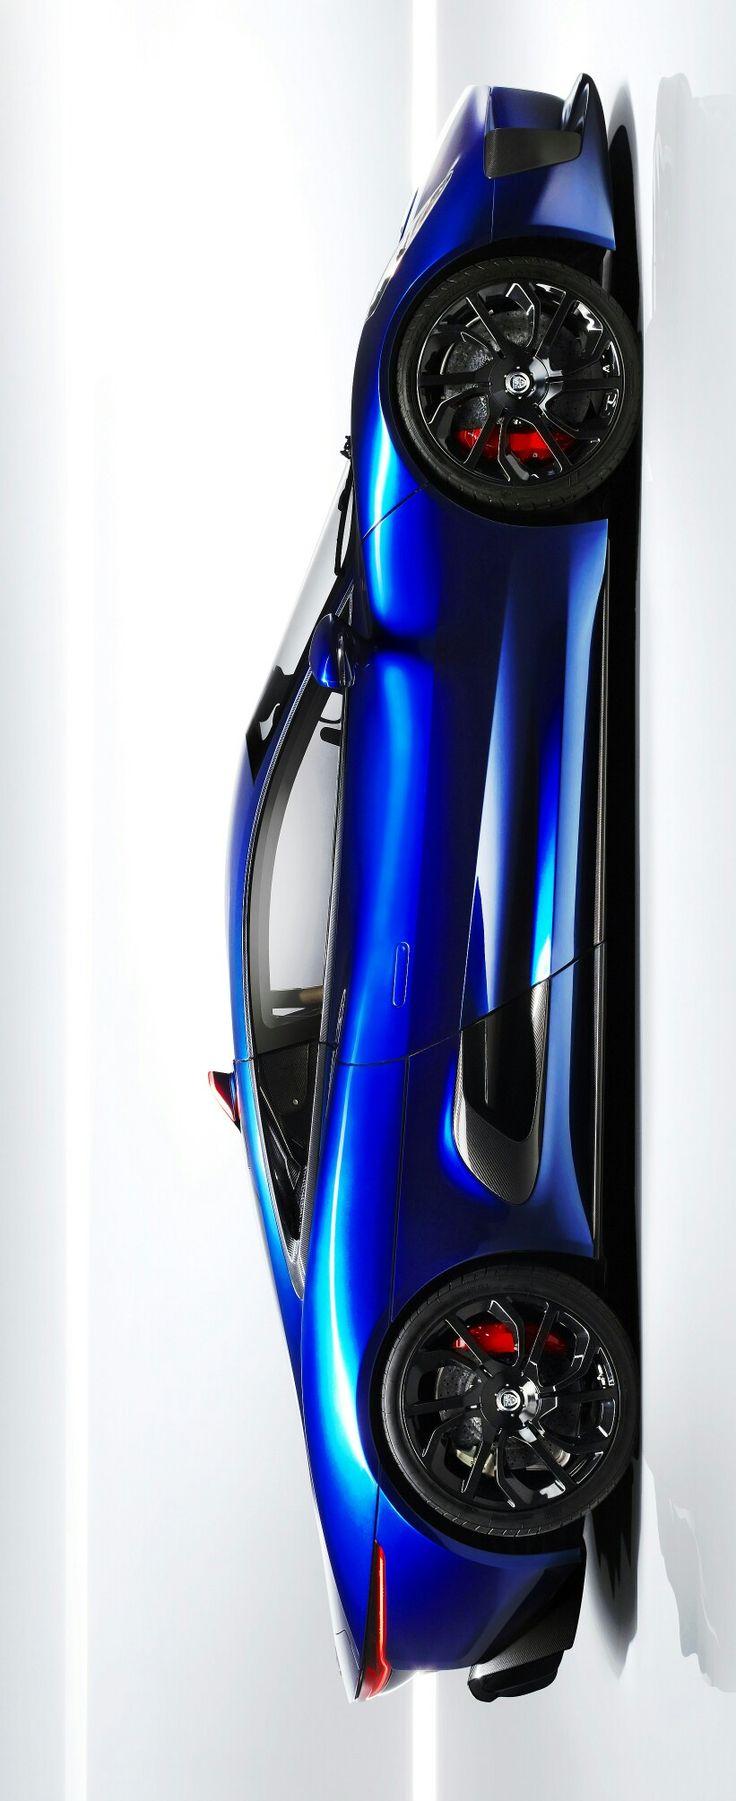 (°!°) 2013 Jaguar C-X75 Hybrid Supercar Prototype 007, thank you Jaguar!